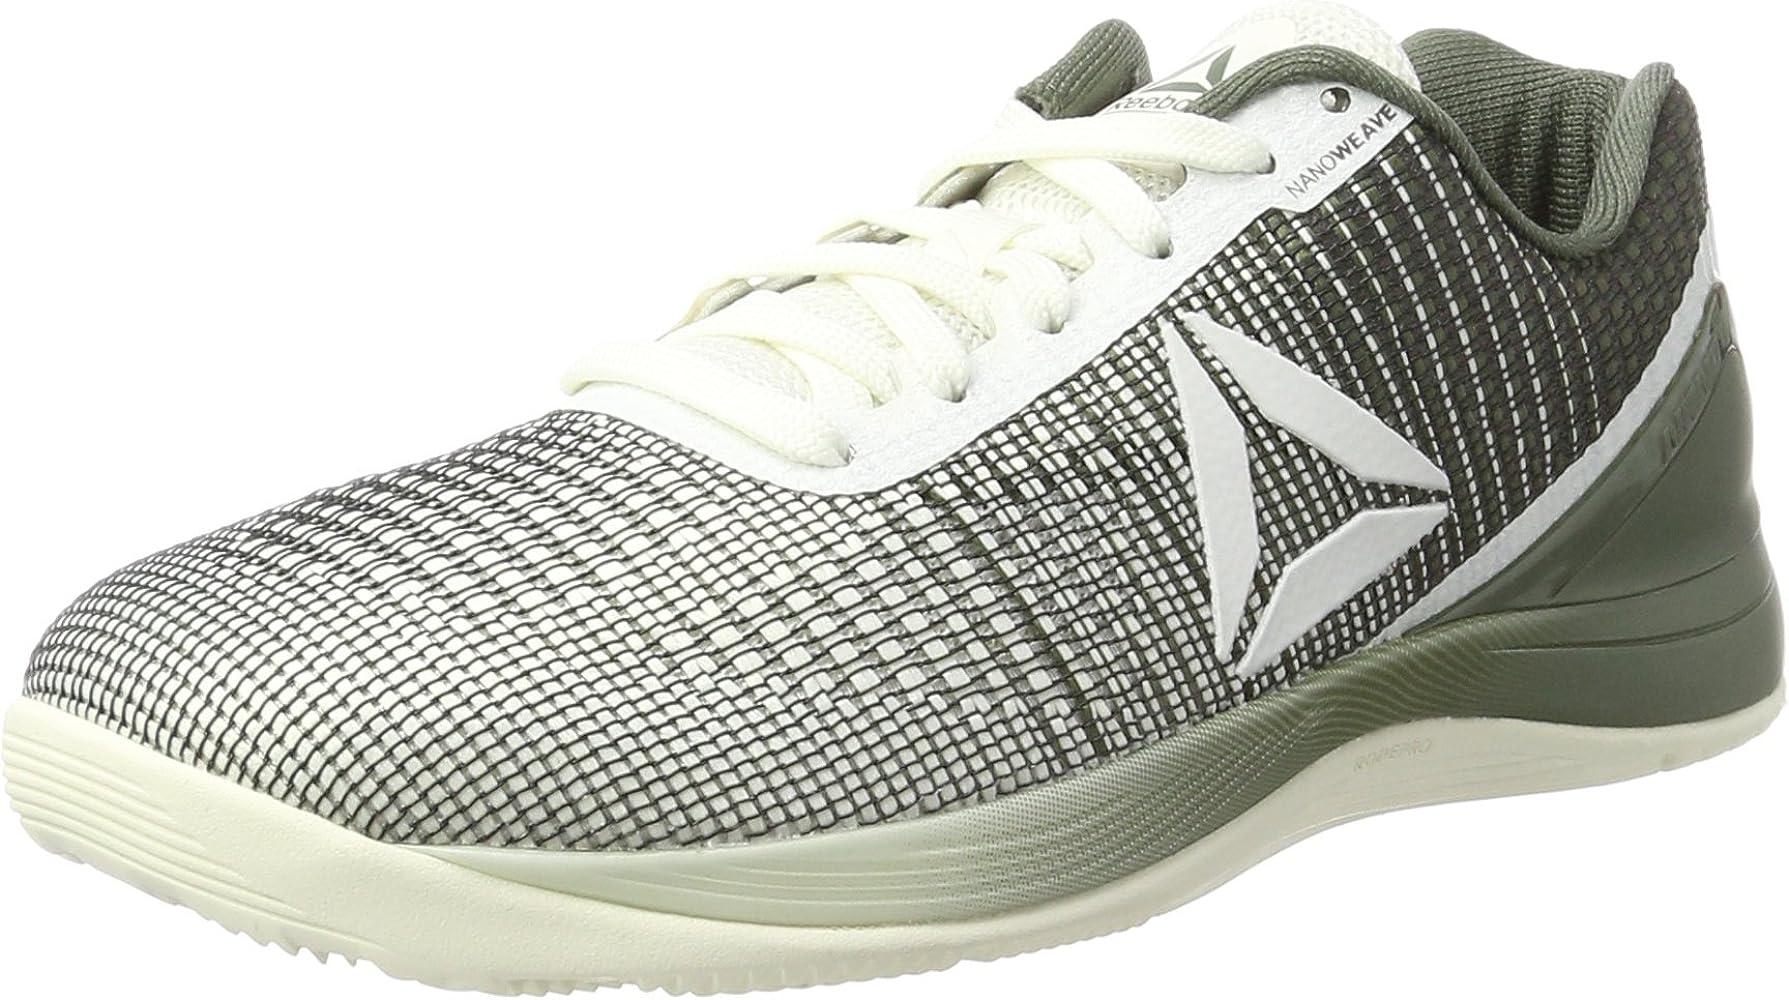 Reebok R Crossfit Nano 7, Chaussures de Running Homme, Beige